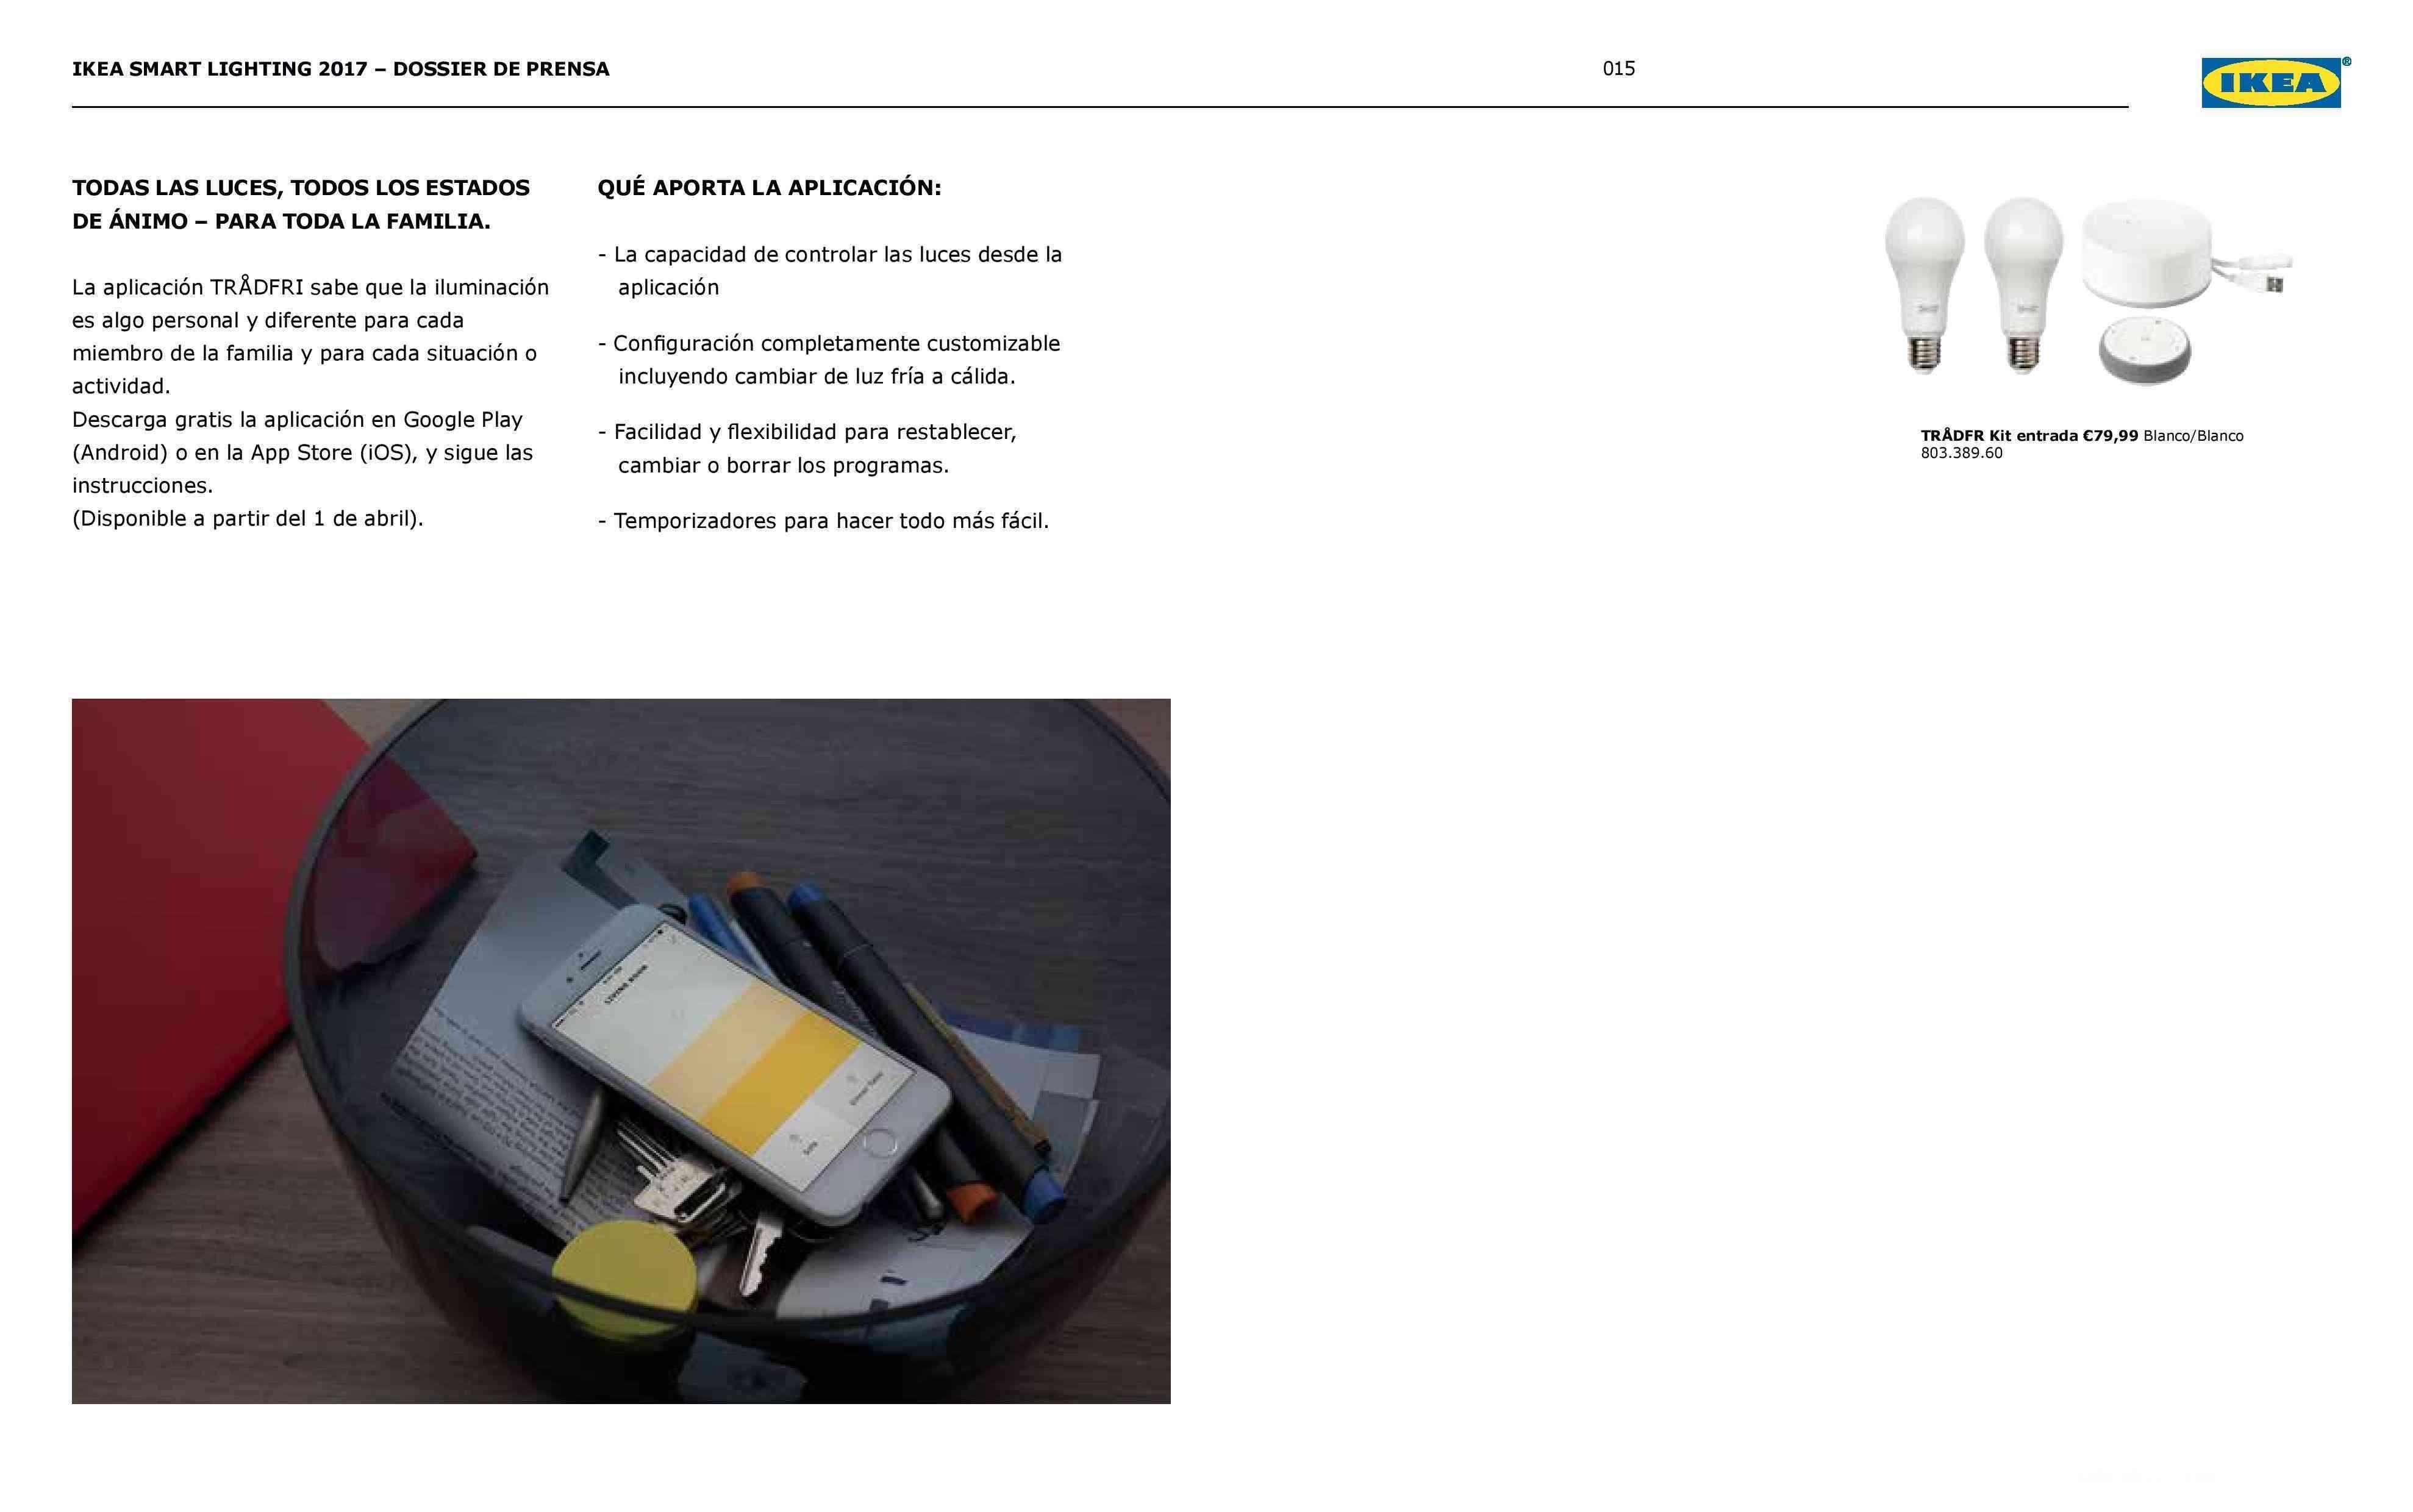 Novedades en iluminación de casas inteligentes con IKEA 71